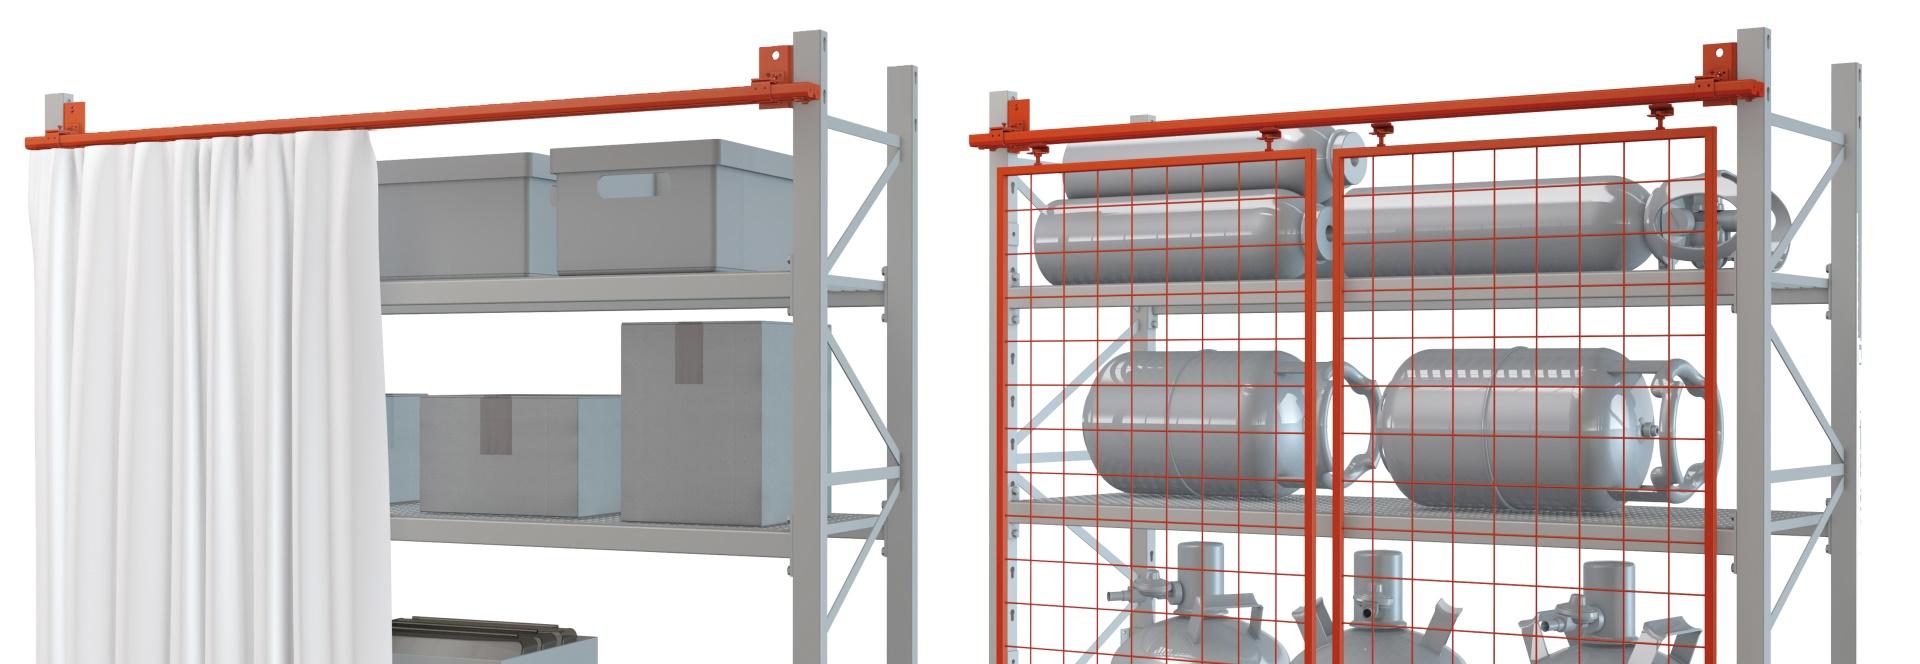 MEA Metal Applications - Produktfokus Schutzvorhang Schutzgitter